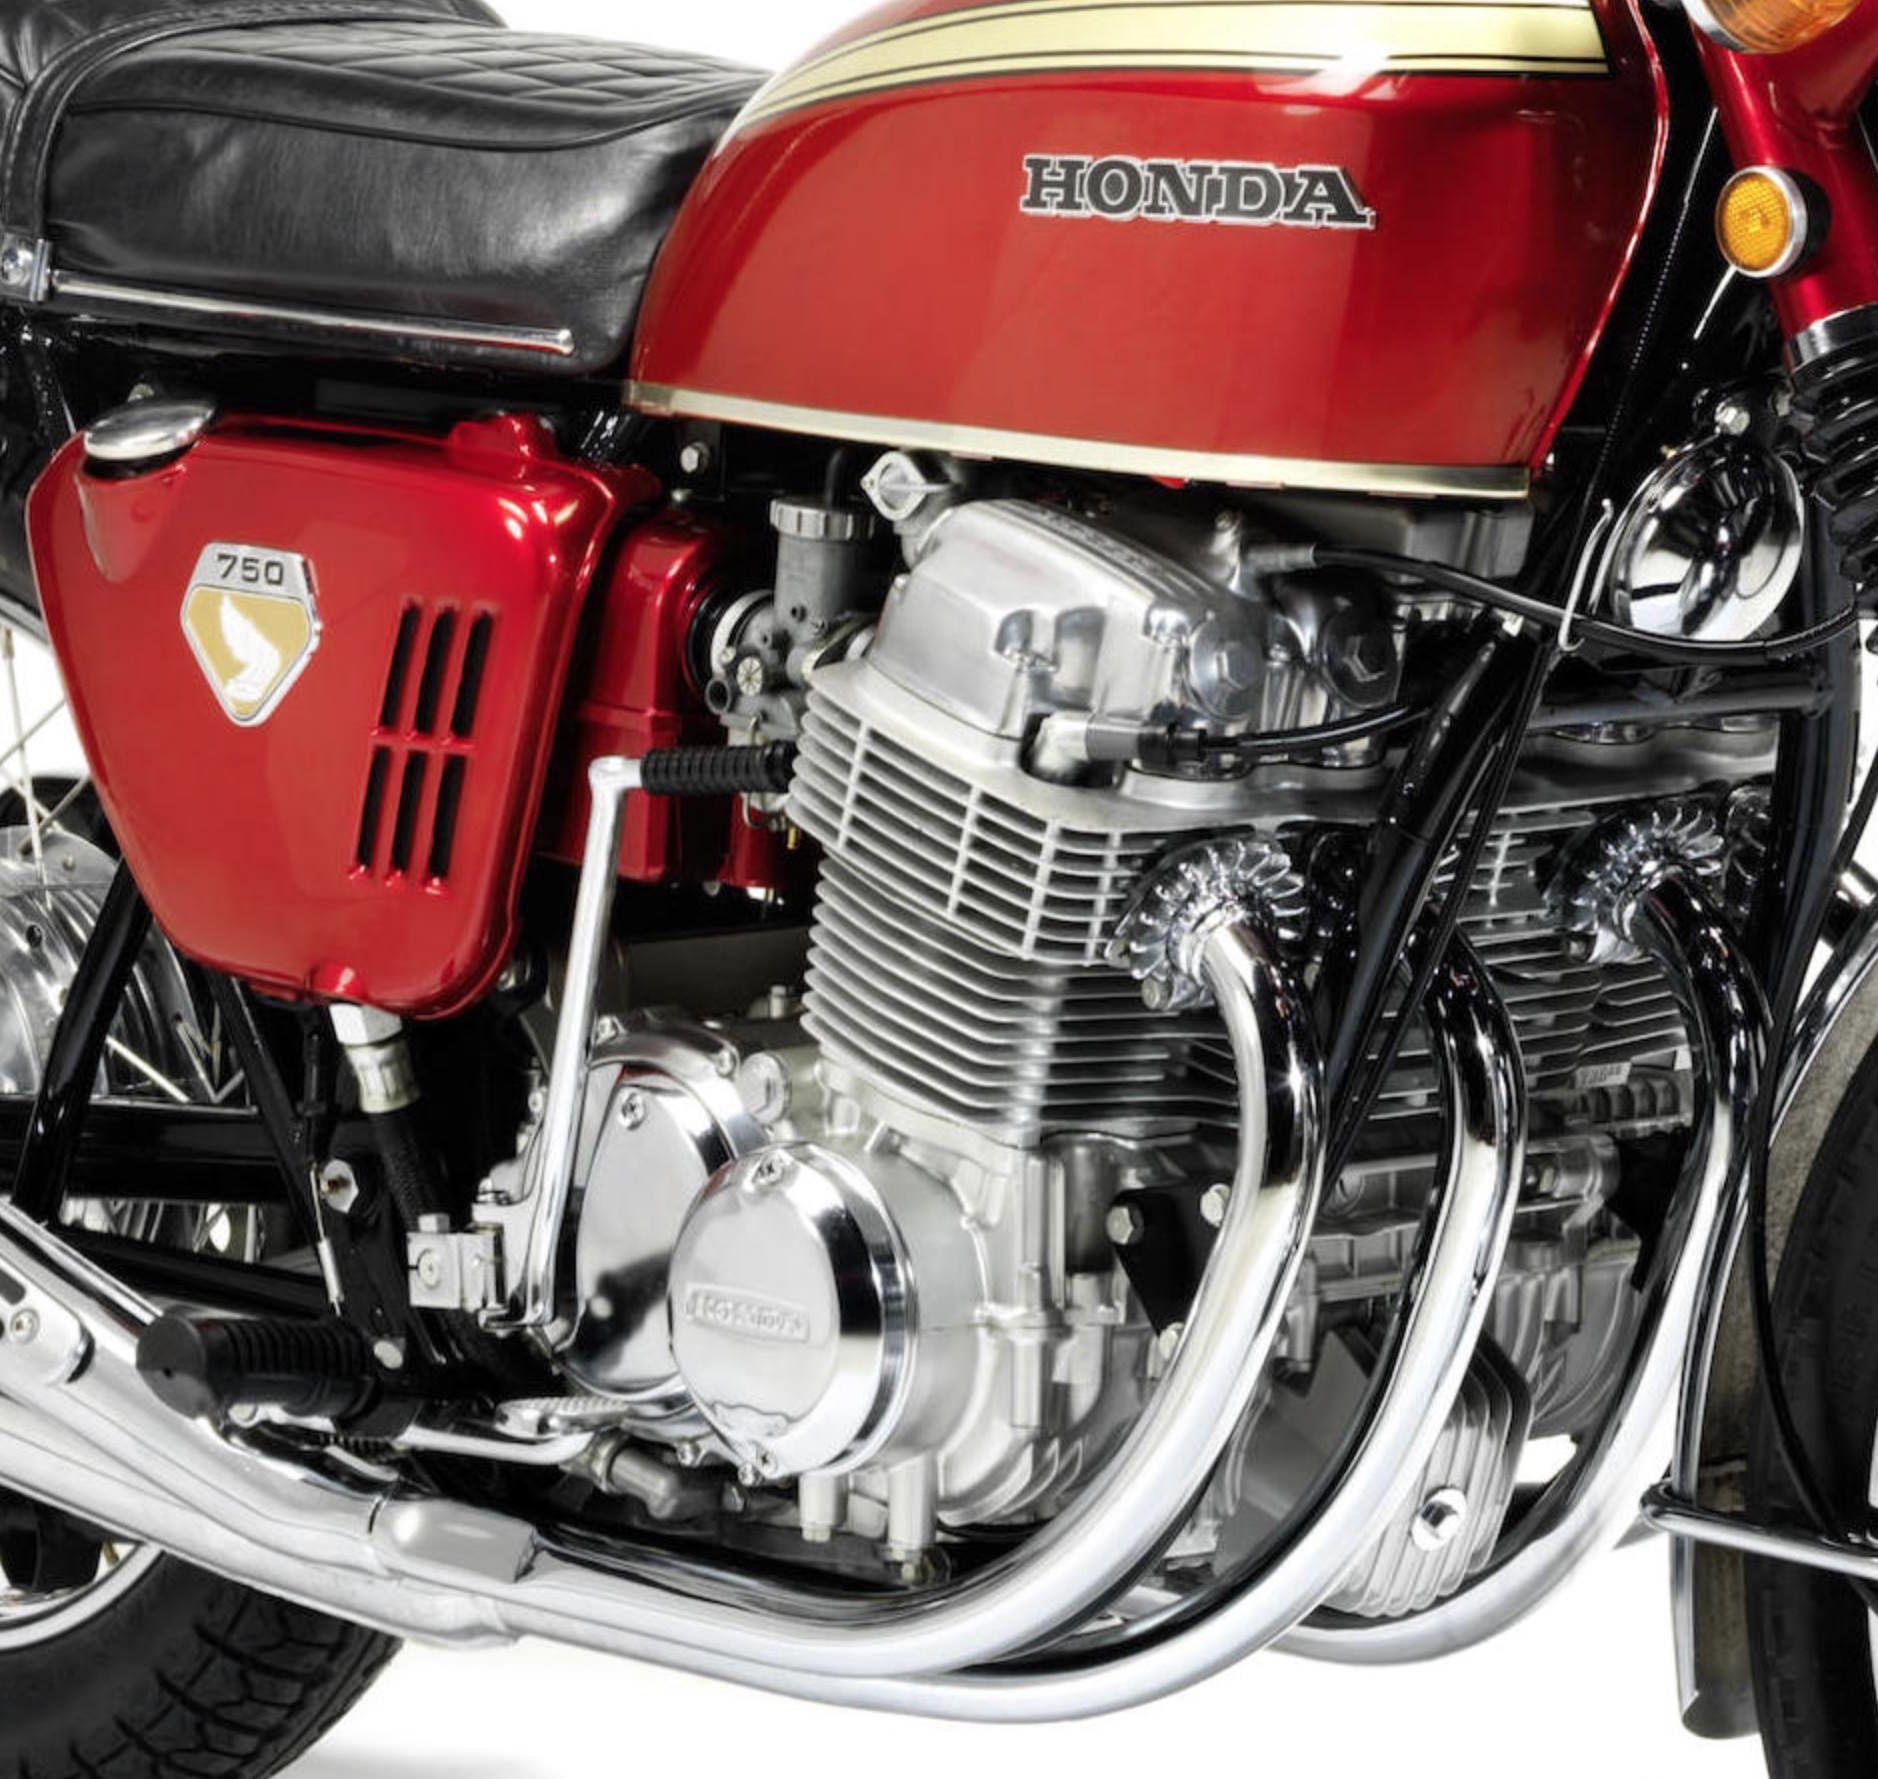 Original Honda CB750 Press Bike Honda cb750, Honda, Cb750